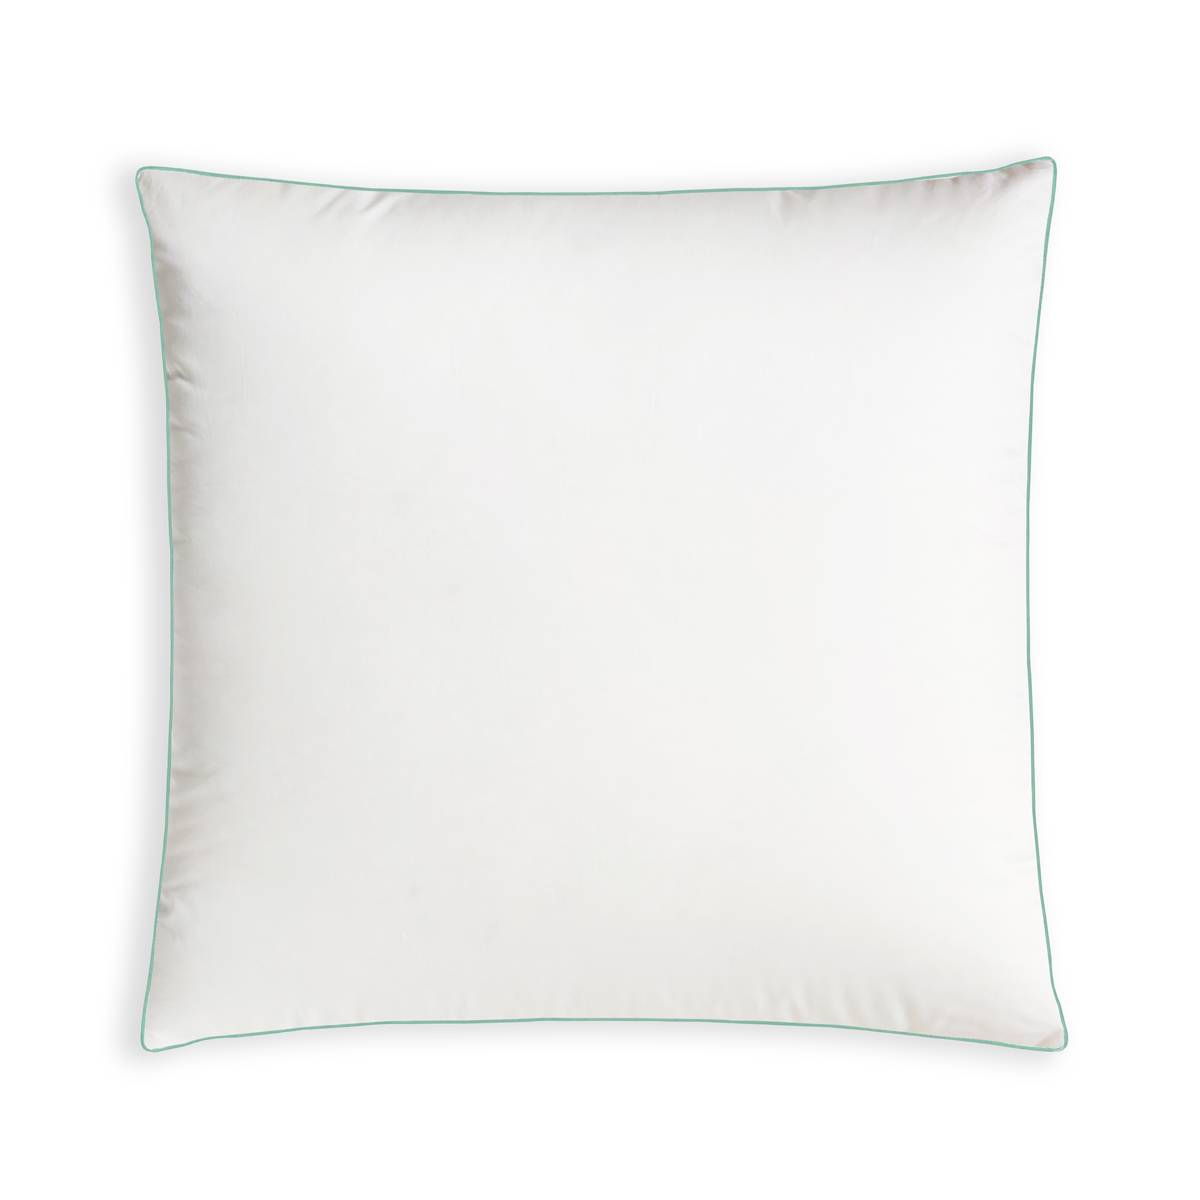 WAKE ME GREEN Oreiller MOELLEUX Gonflant Durable - Coton Bio  60x60 cm